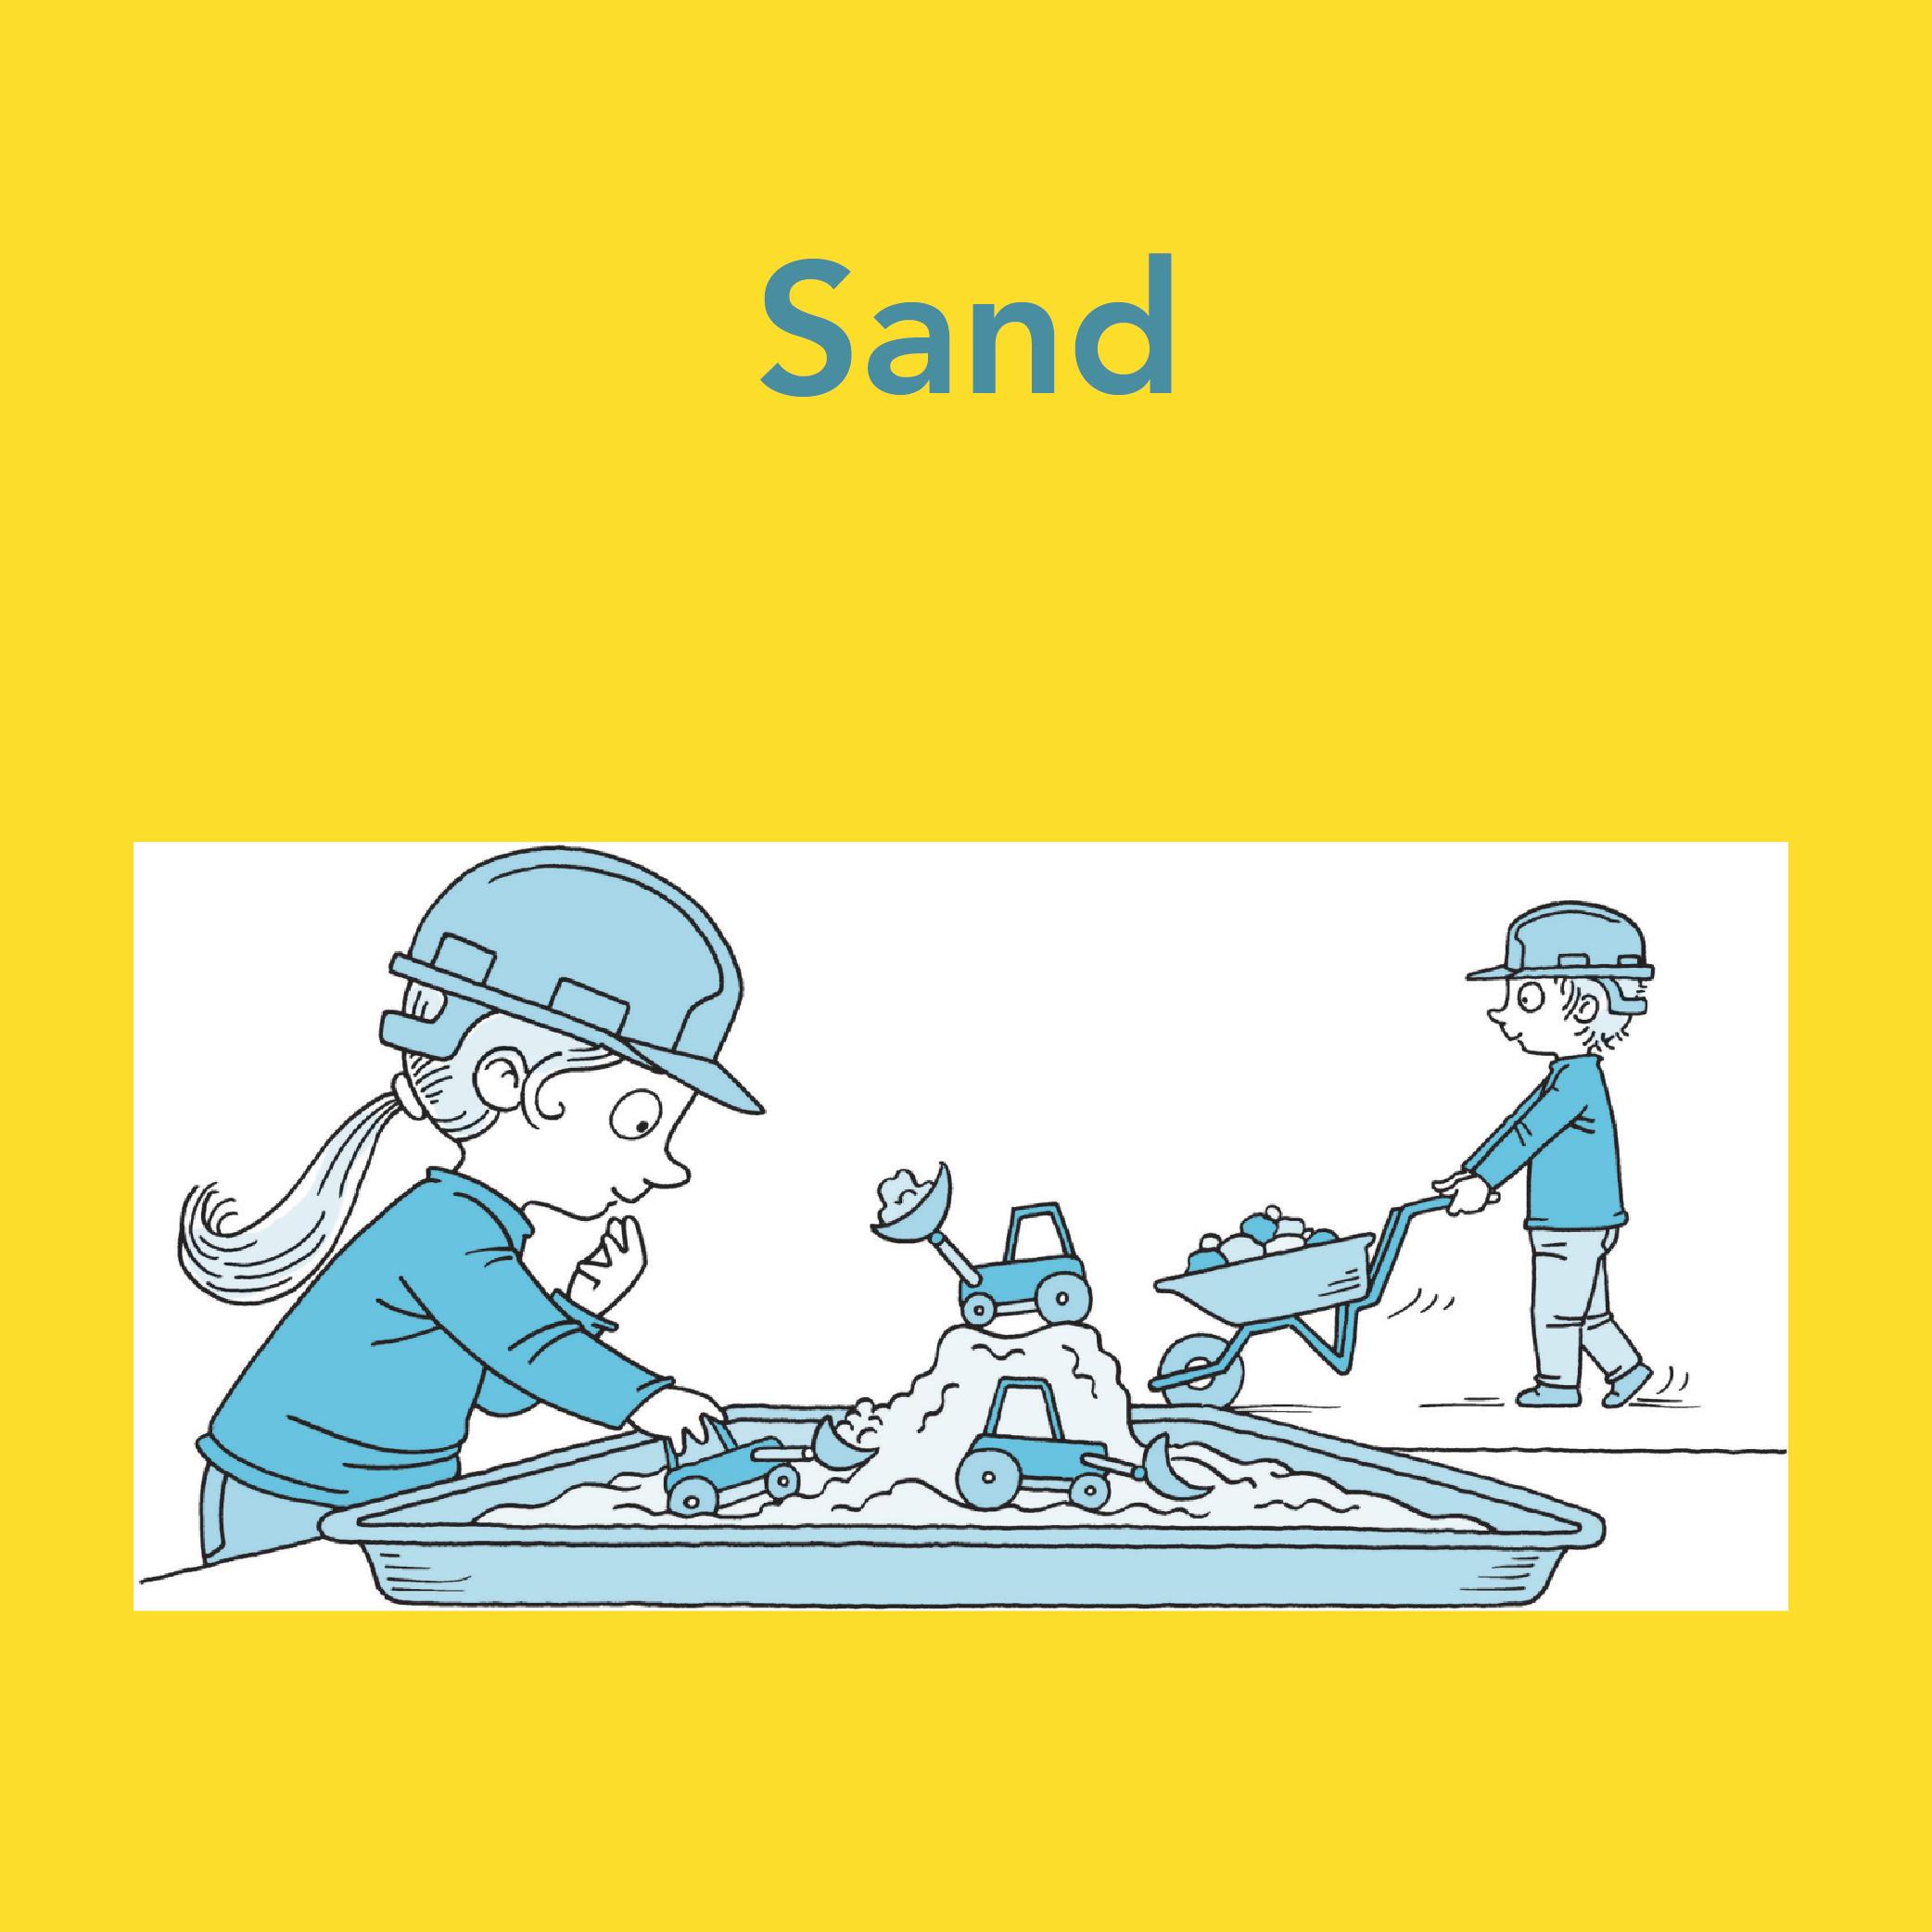 sand=